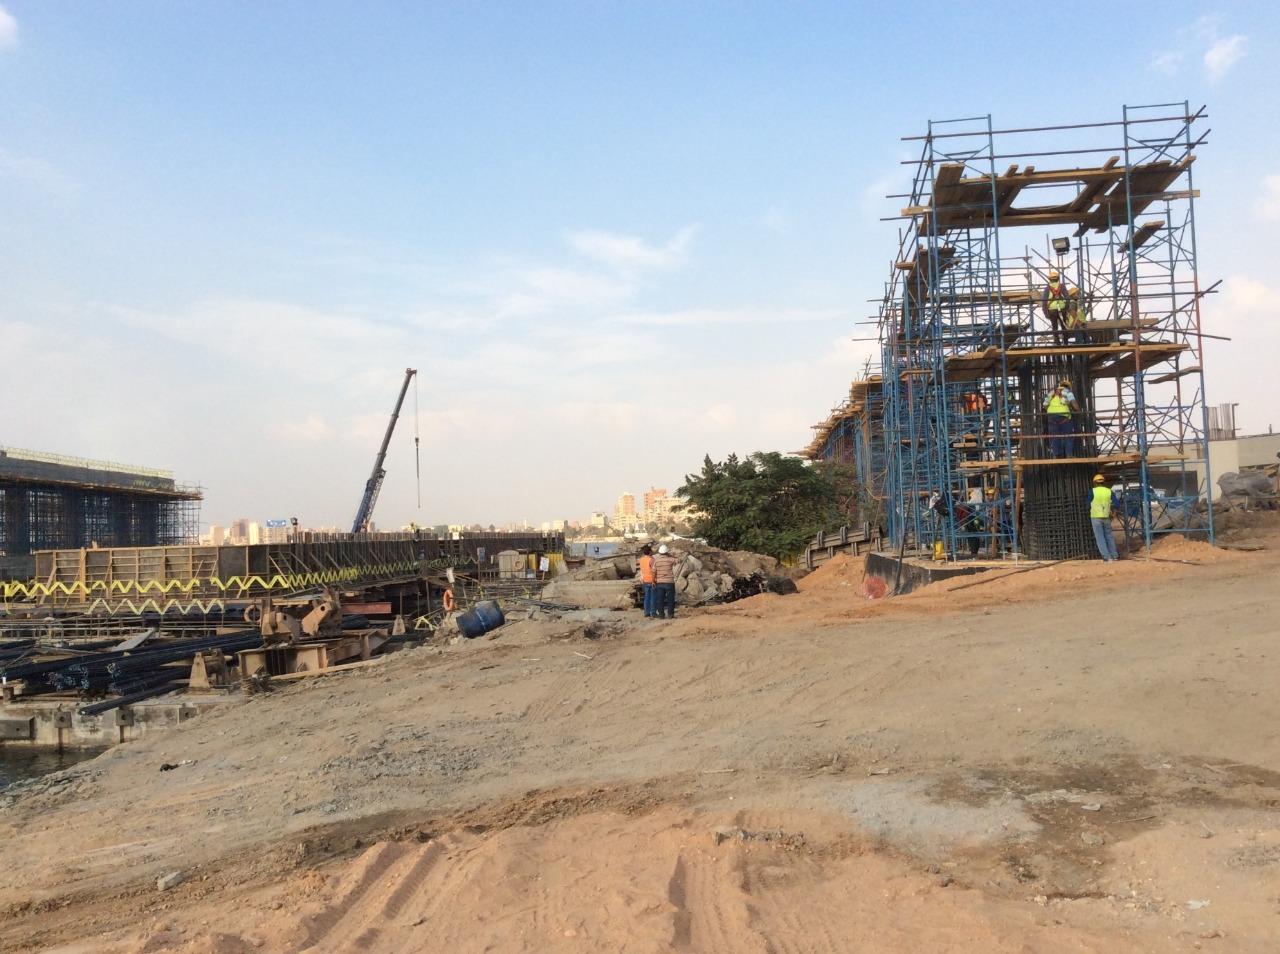 Quay Wall Terminal at East Port Said Port